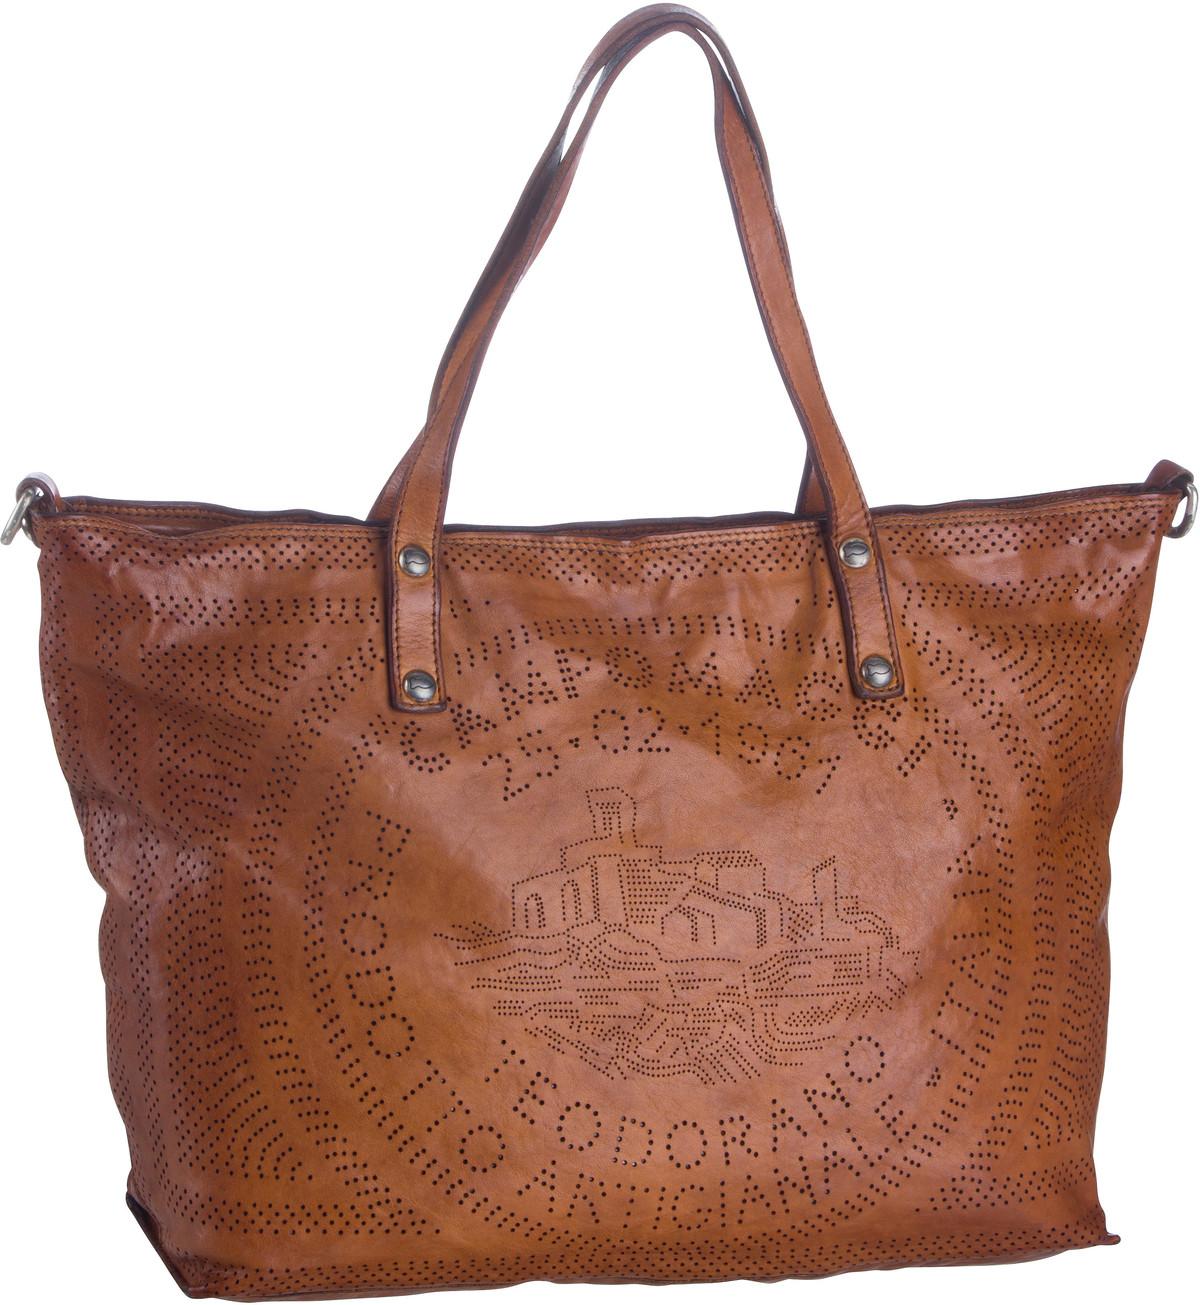 Shopper - Campomaggi Shopper Cala Rossa C0290 Cognac  - Onlineshop Taschenkaufhaus